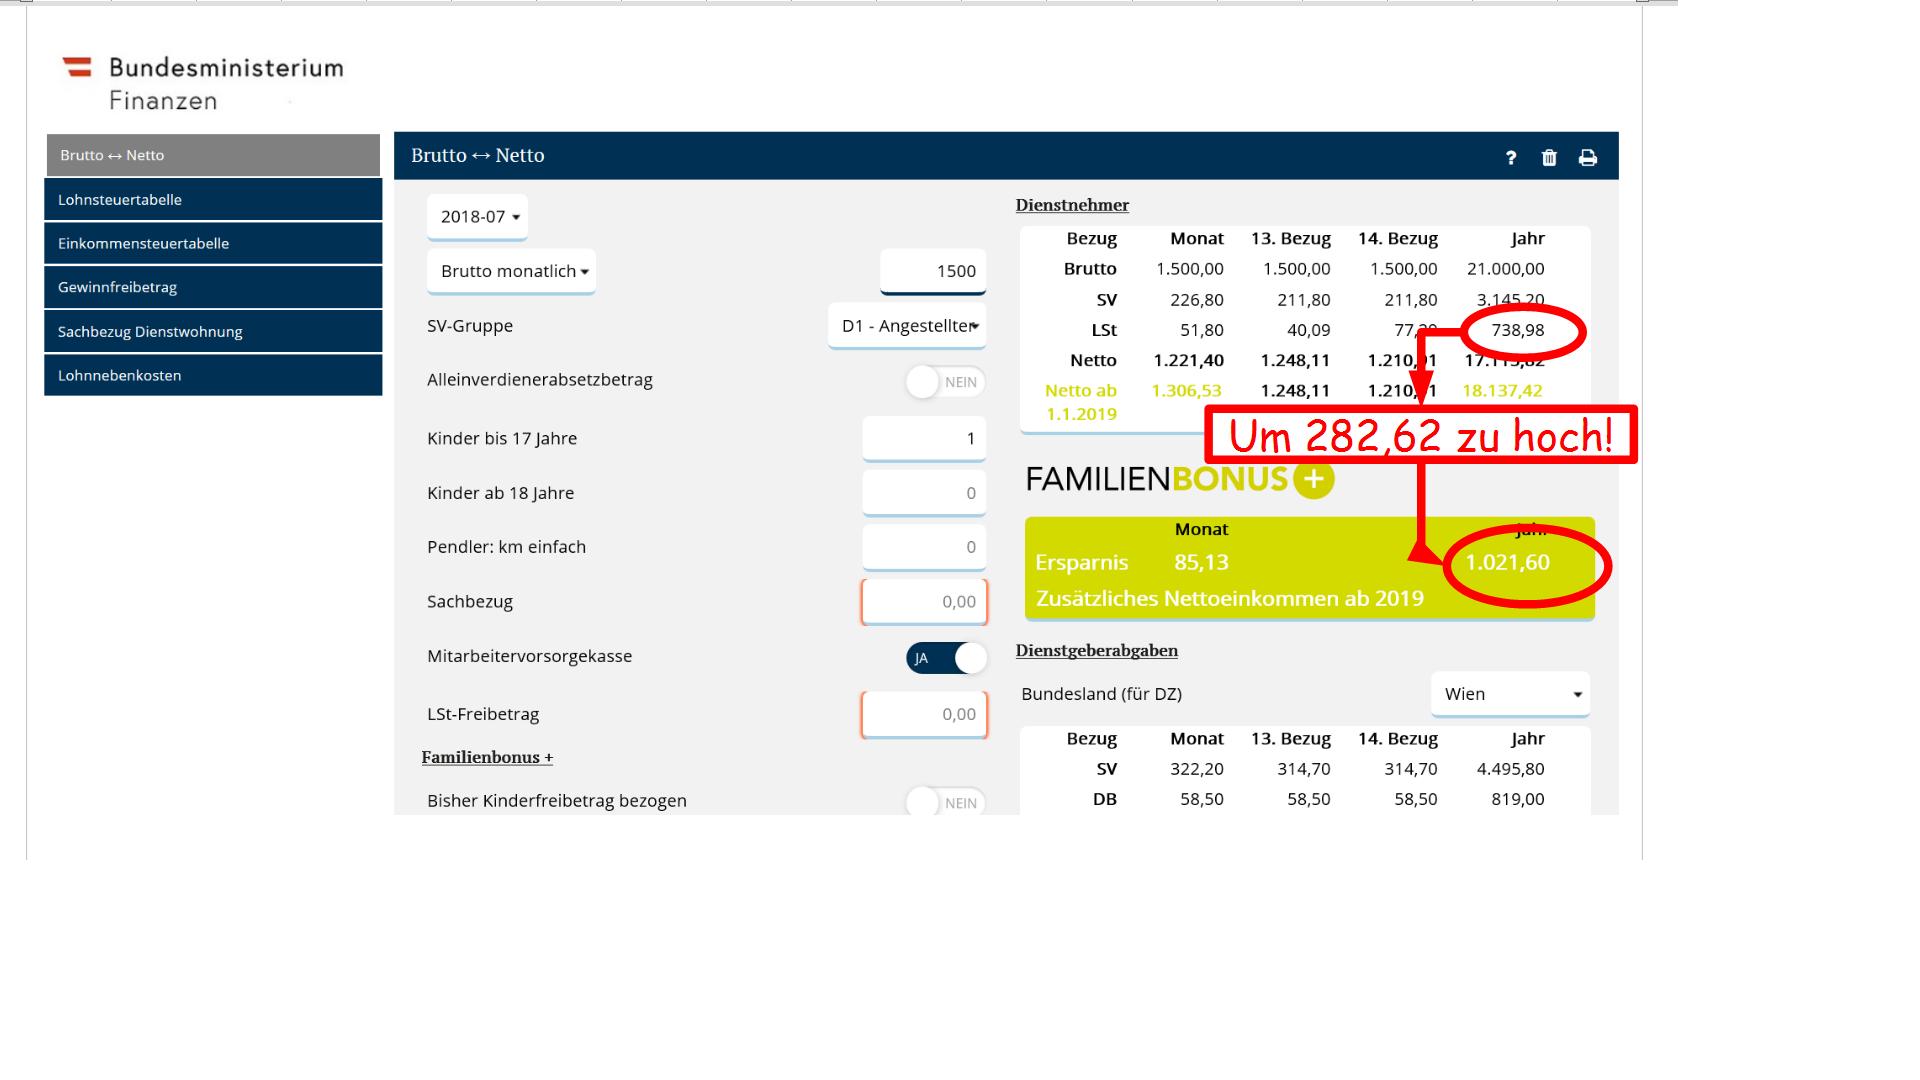 screenshot des Familienbonusrechners bei 1.500 Euro Bruttoeinkmmen